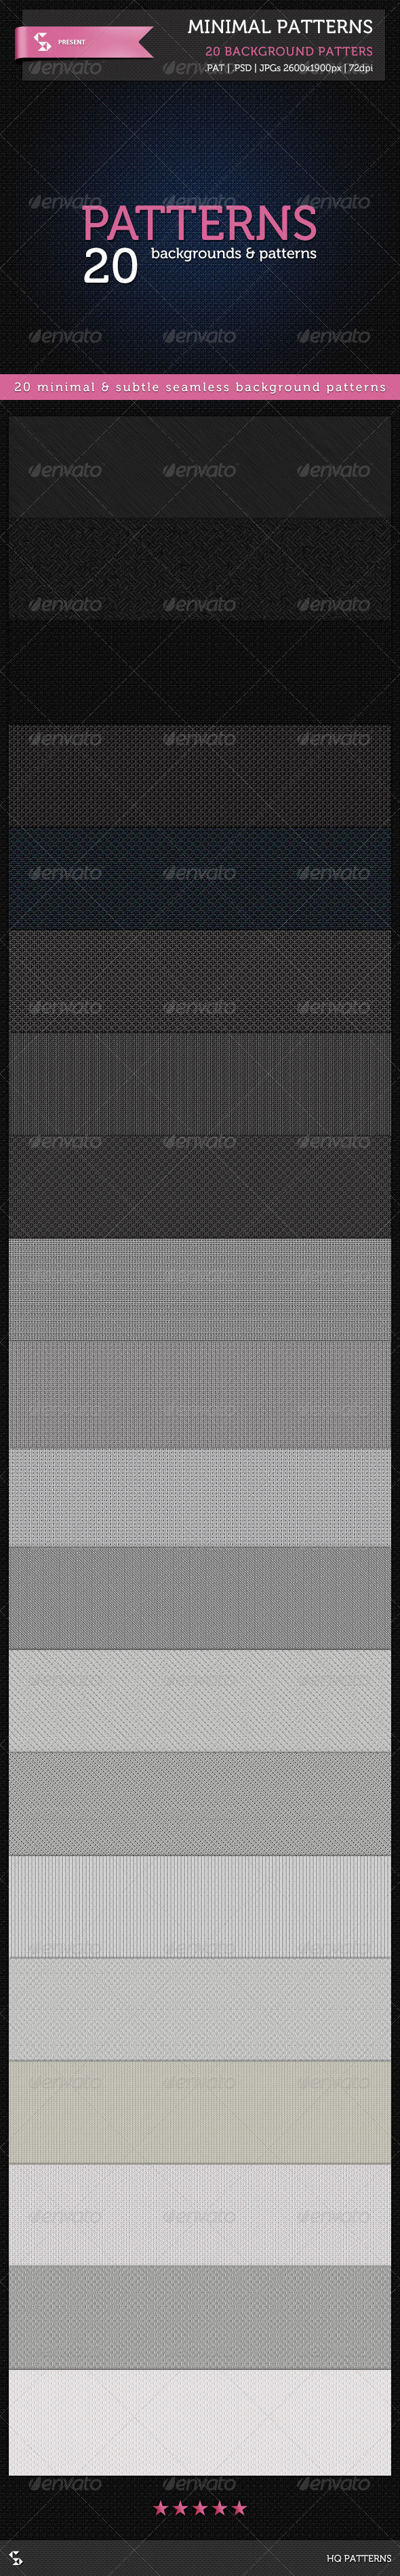 GraphicRiver 20 Minimal Patterns Subtle Background Patterns 6903655